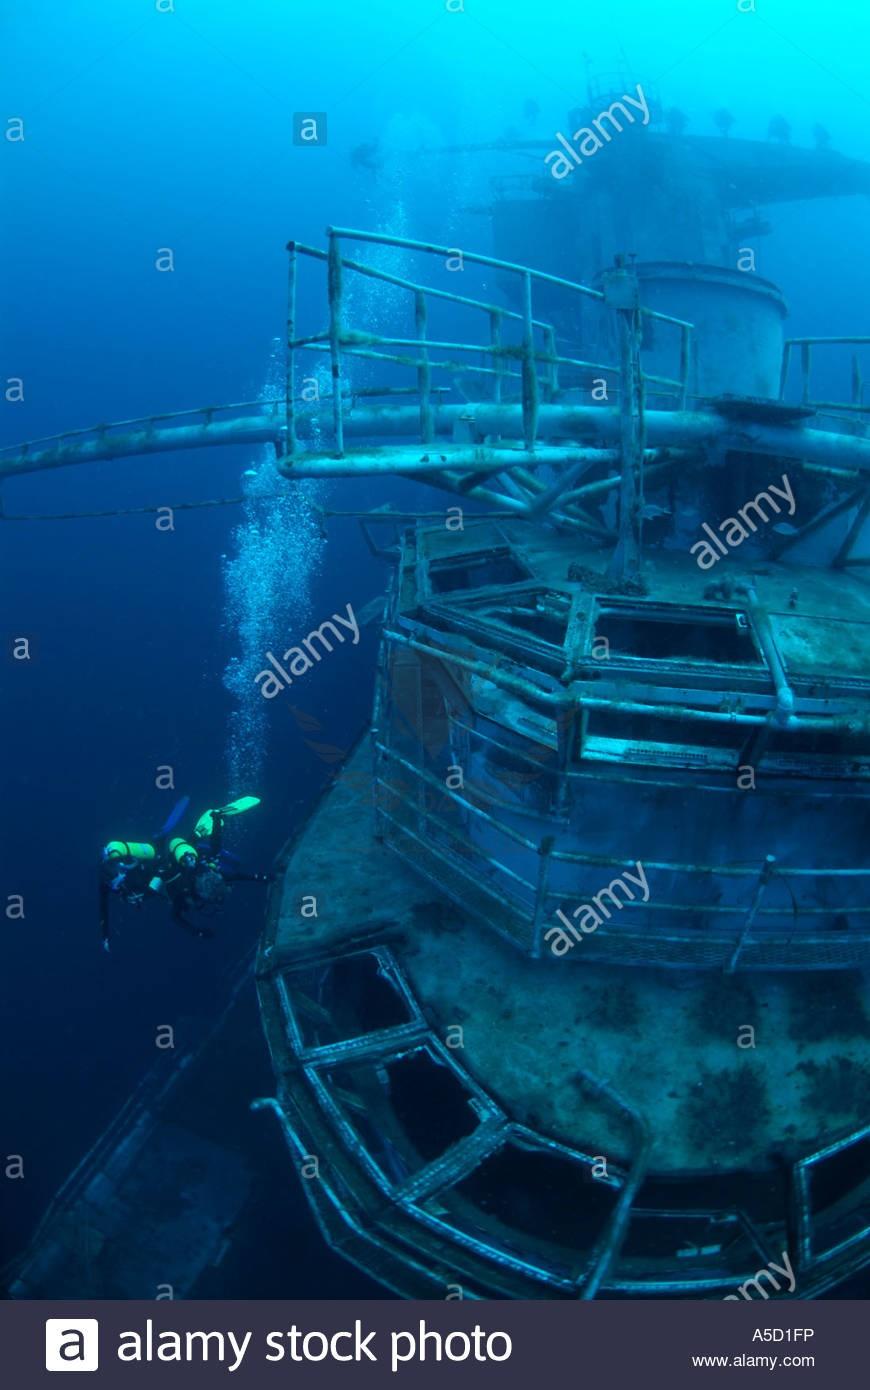 oriskany-wreck-sunk-off-pensacola-florida-gulf-of-mexico-A5D1FP.jpg